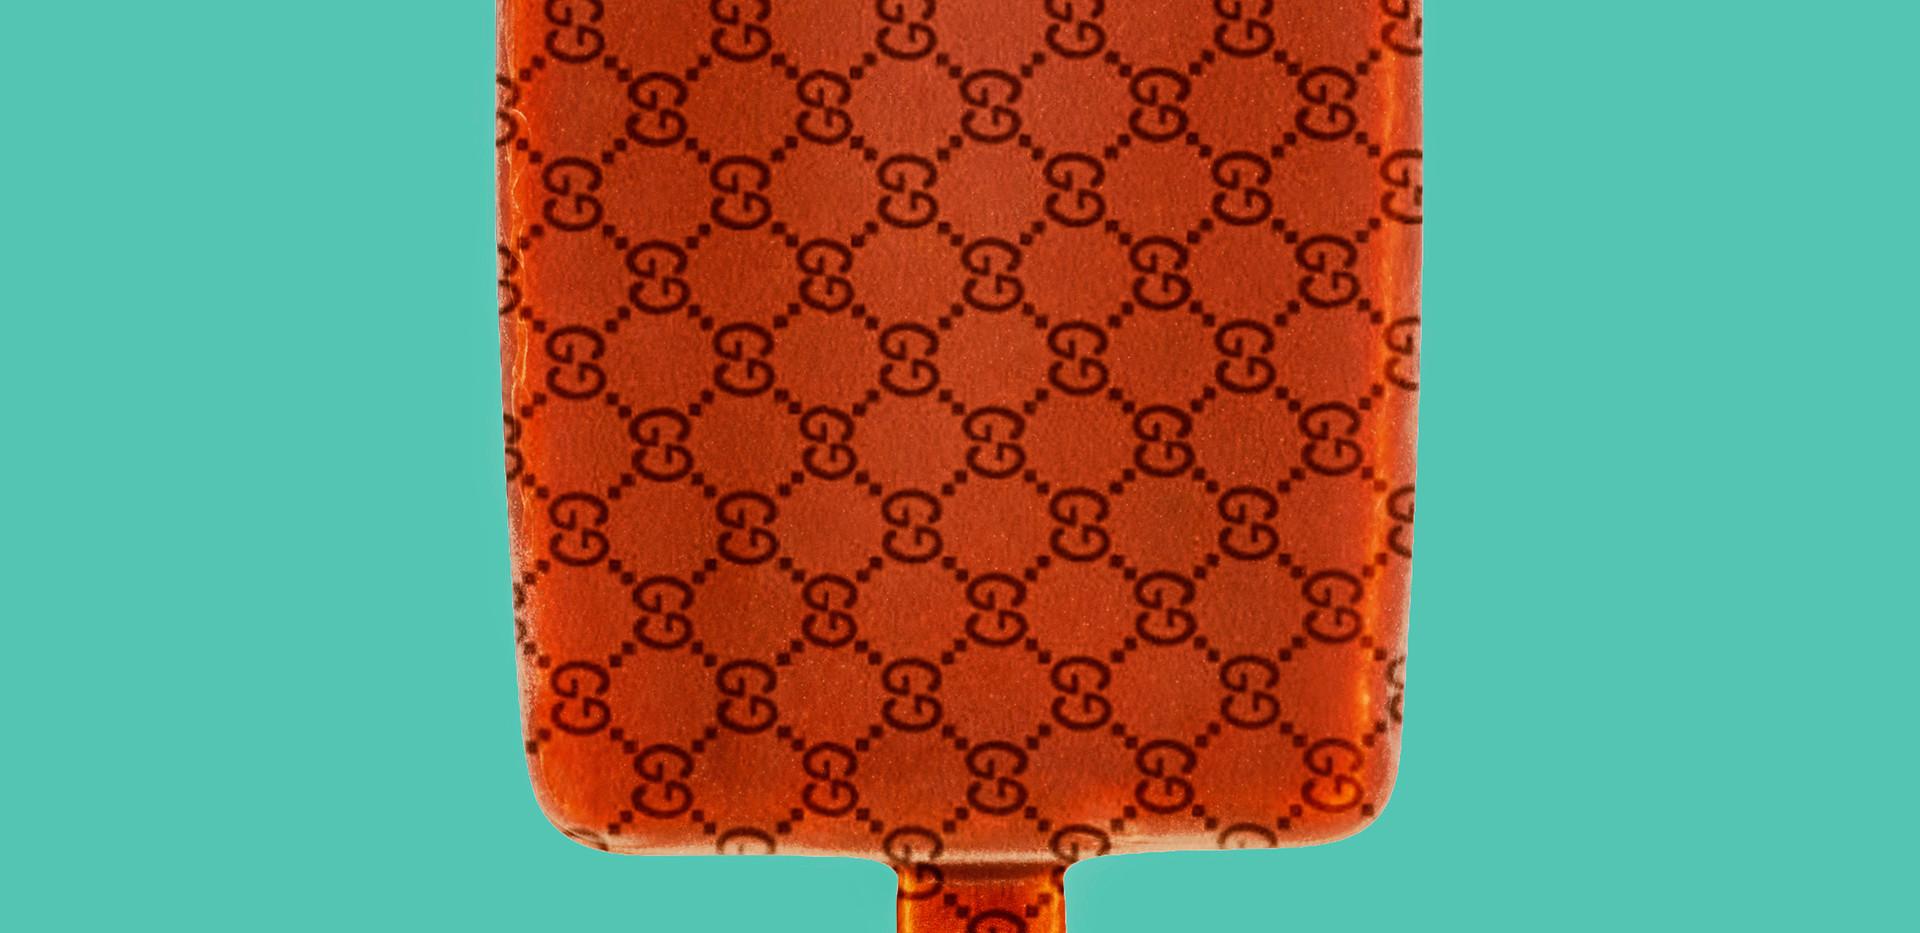 Gucci inspire ice cream.jpg